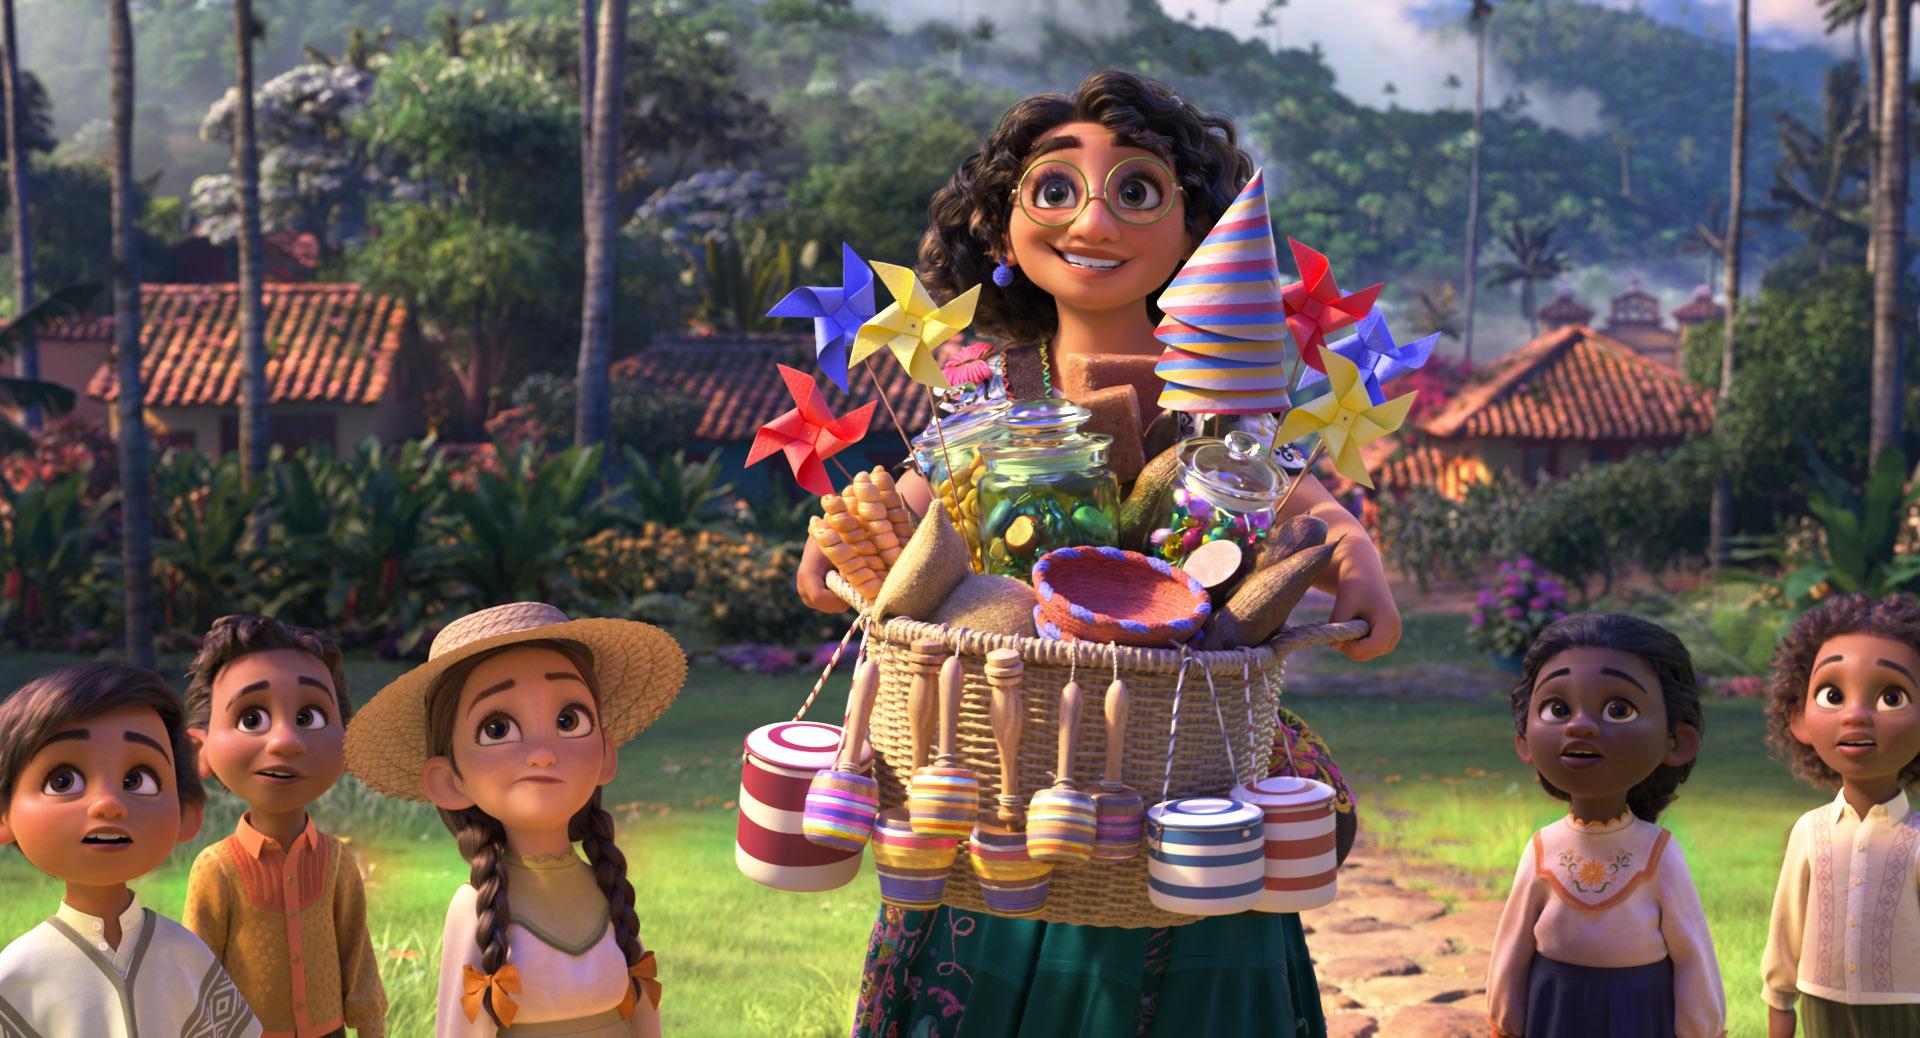 Opinion: Let Hispanics and Latinx Take Film's Centerstage